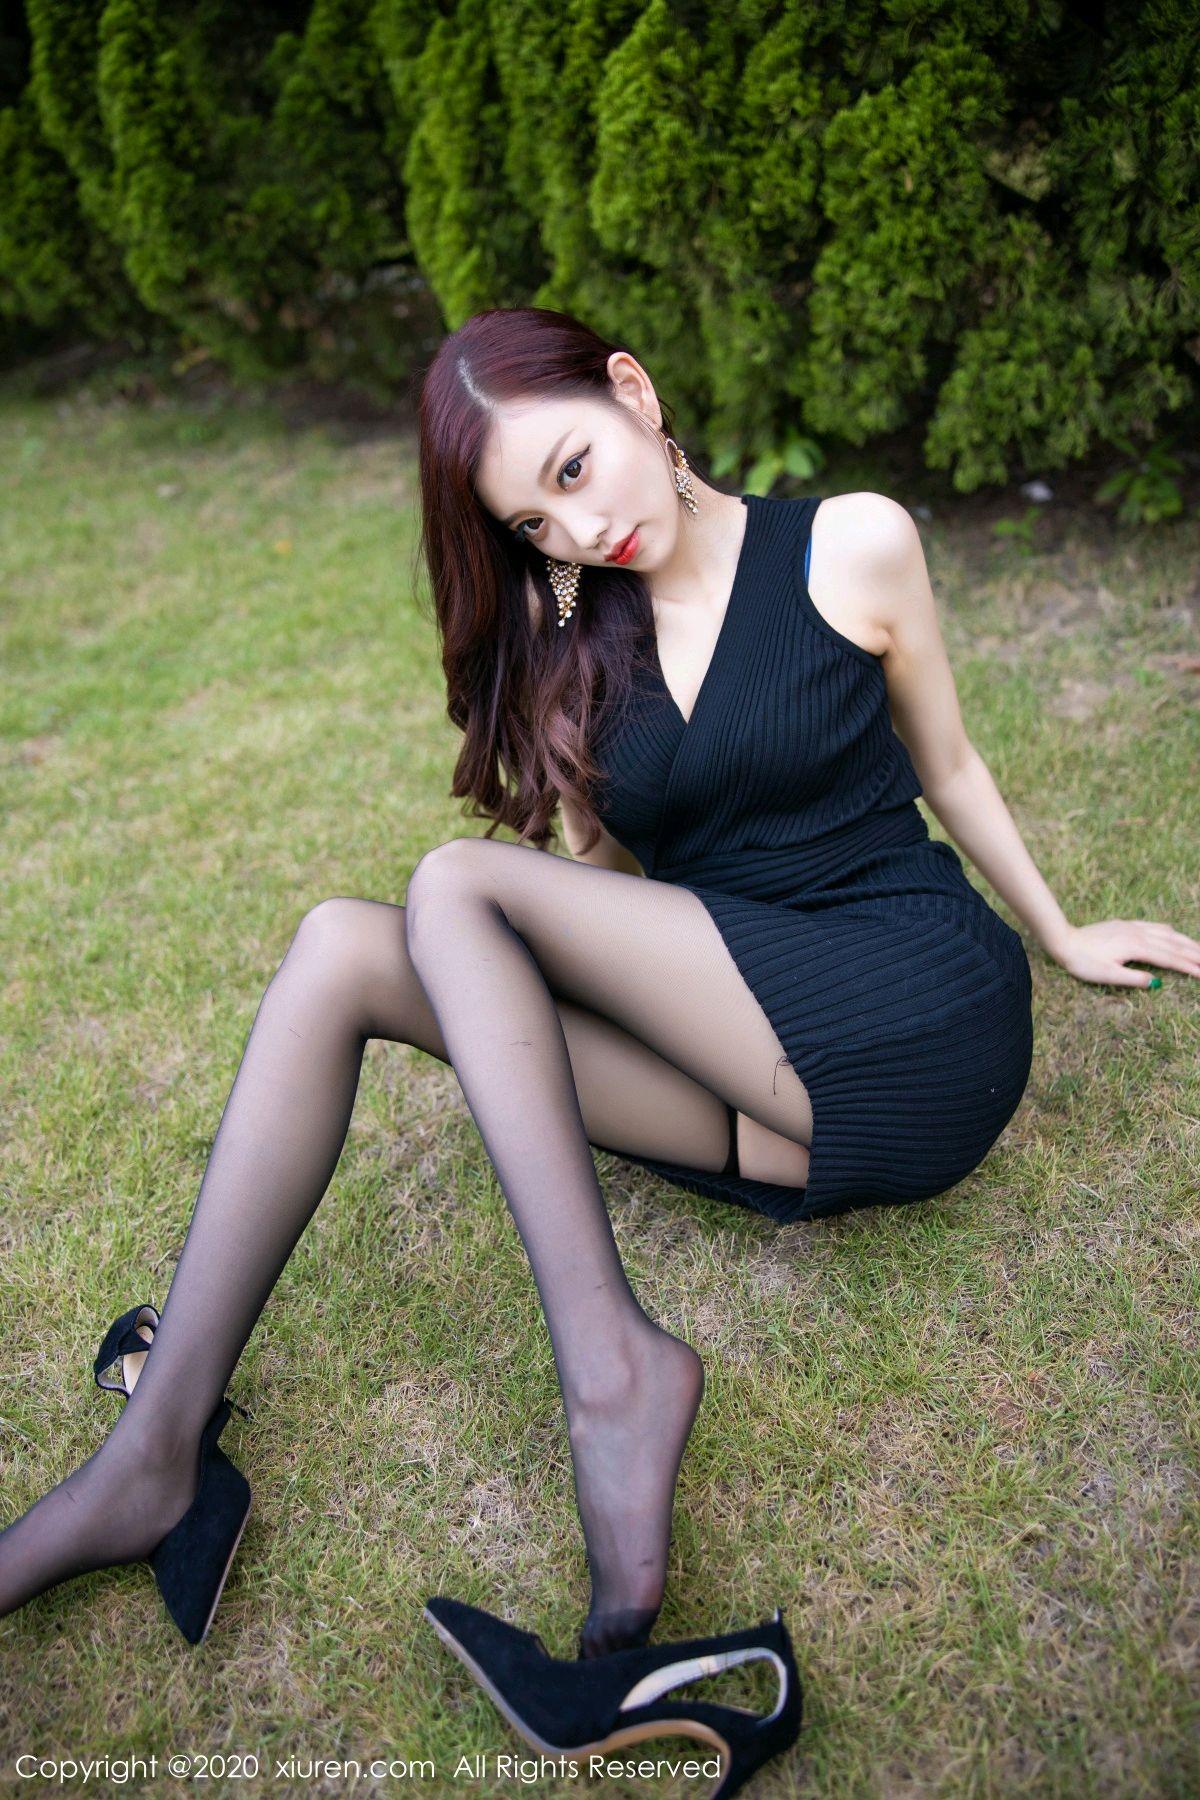 [XiuRen] Vol.2648 Yang Chen Chen 24P, Black Silk, Outdoor, Xiuren, Yang Chen Chen